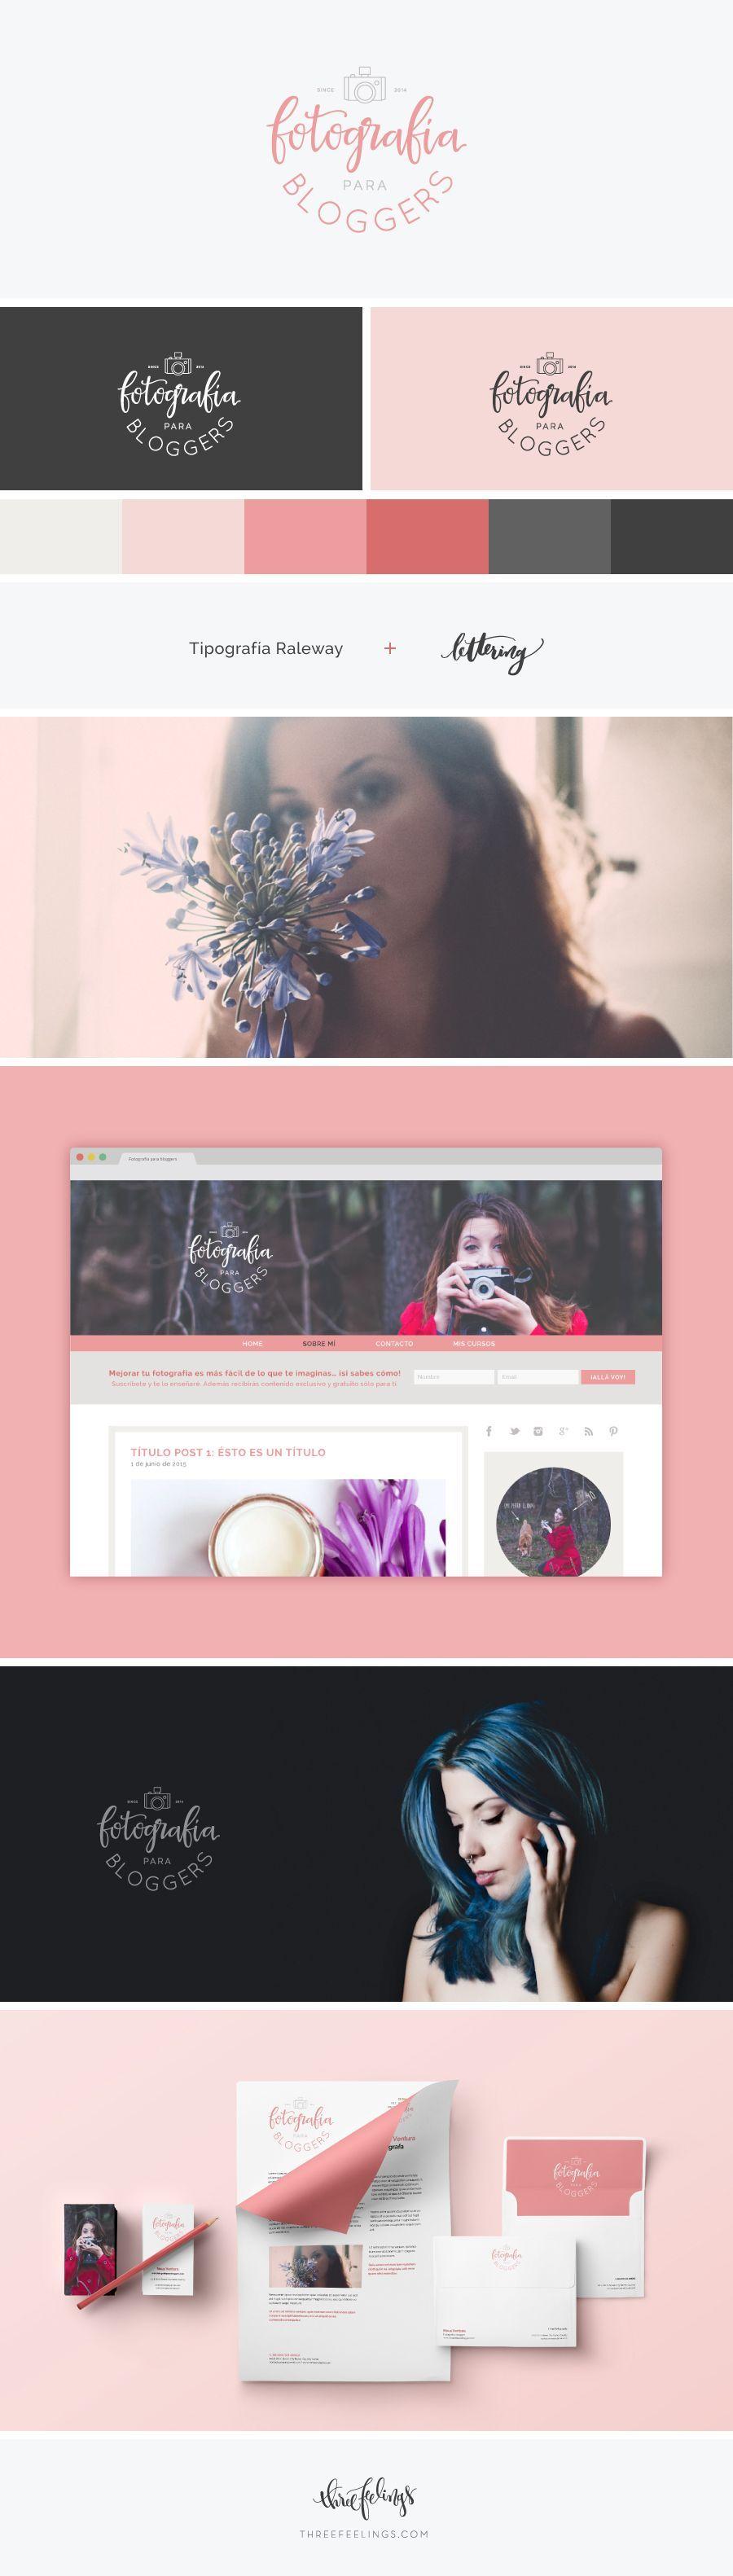 Portfolio-FotografiaParaBloggers